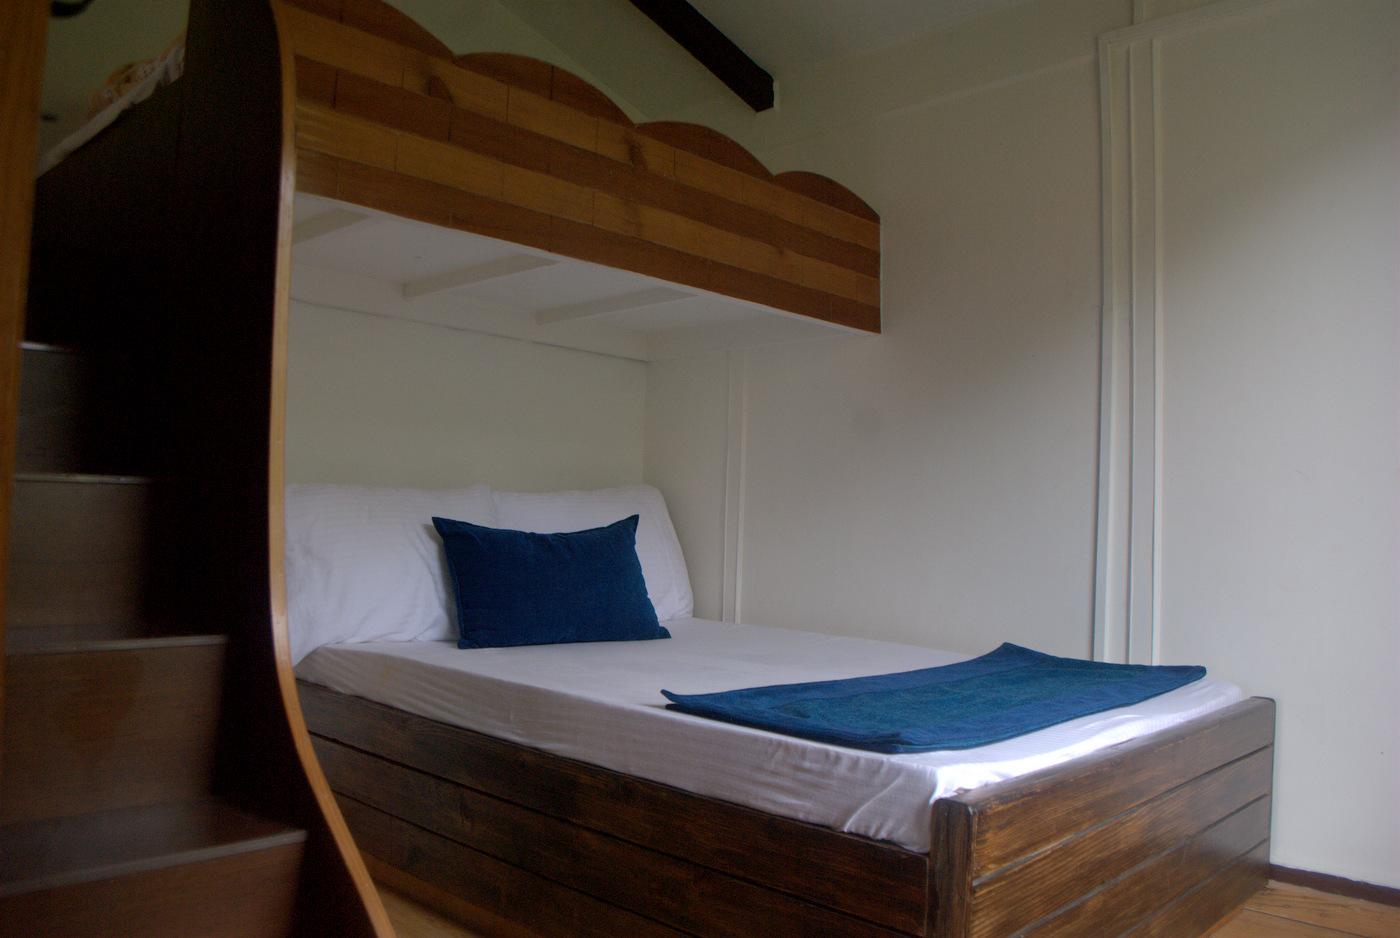 Rosevilla Suite - Bunk beds